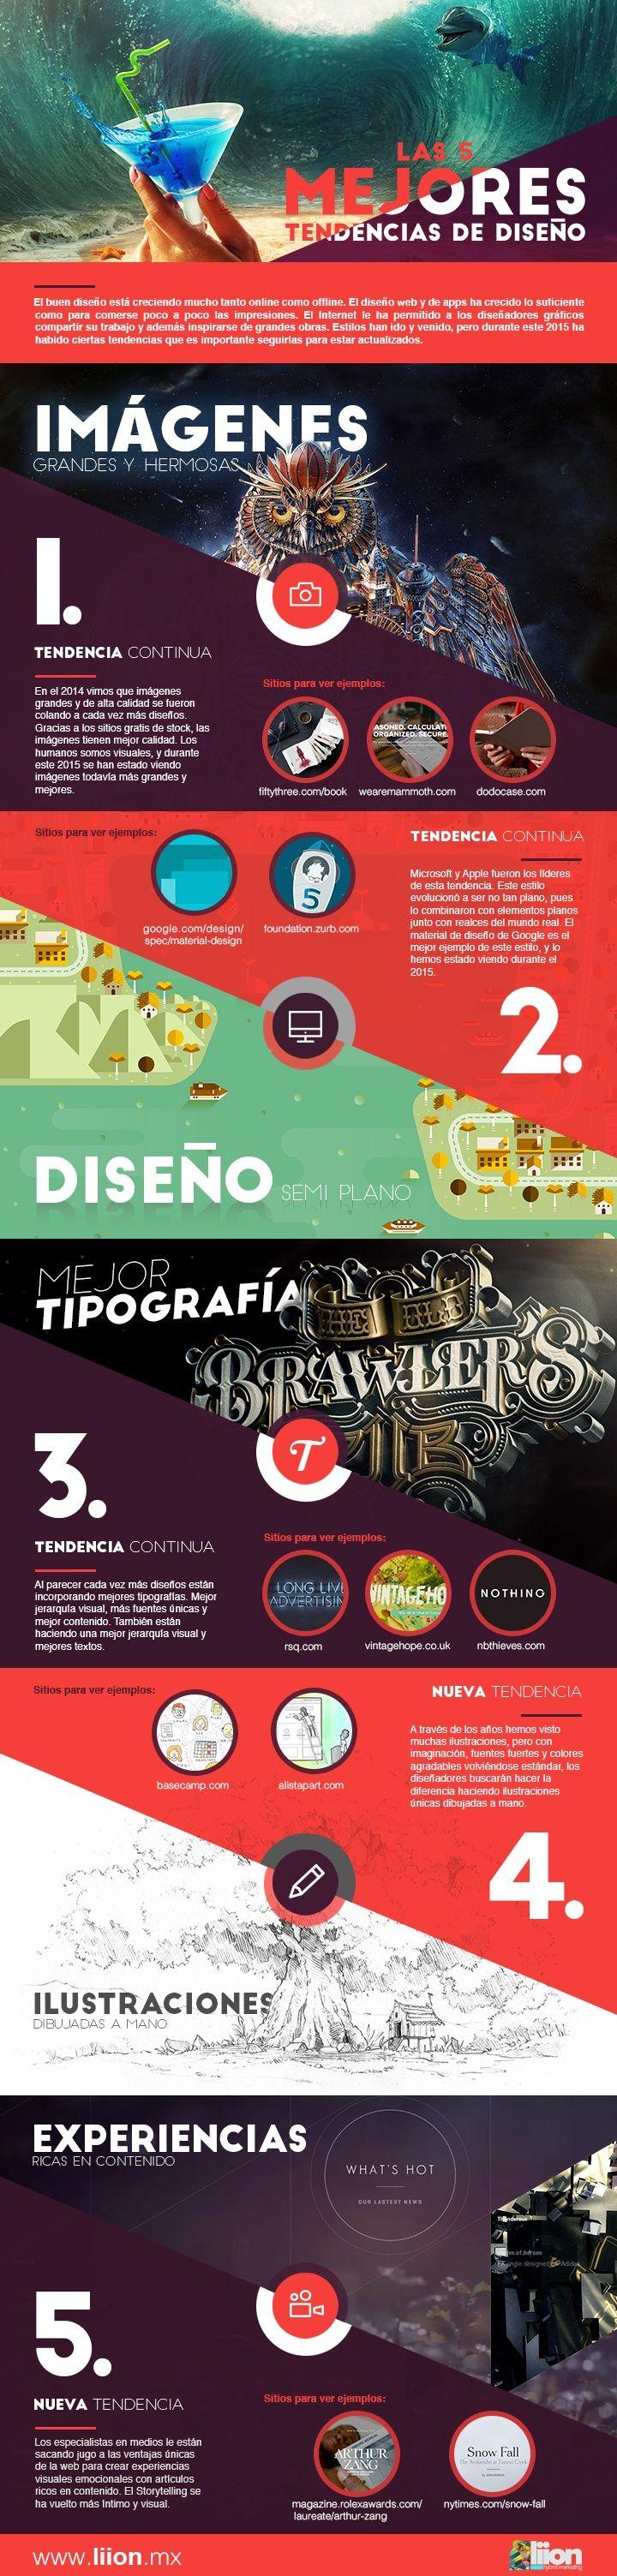 https://alfredovela.files.wordpress.com/2015/07/5-tendencias-diseno-infografia.jpg